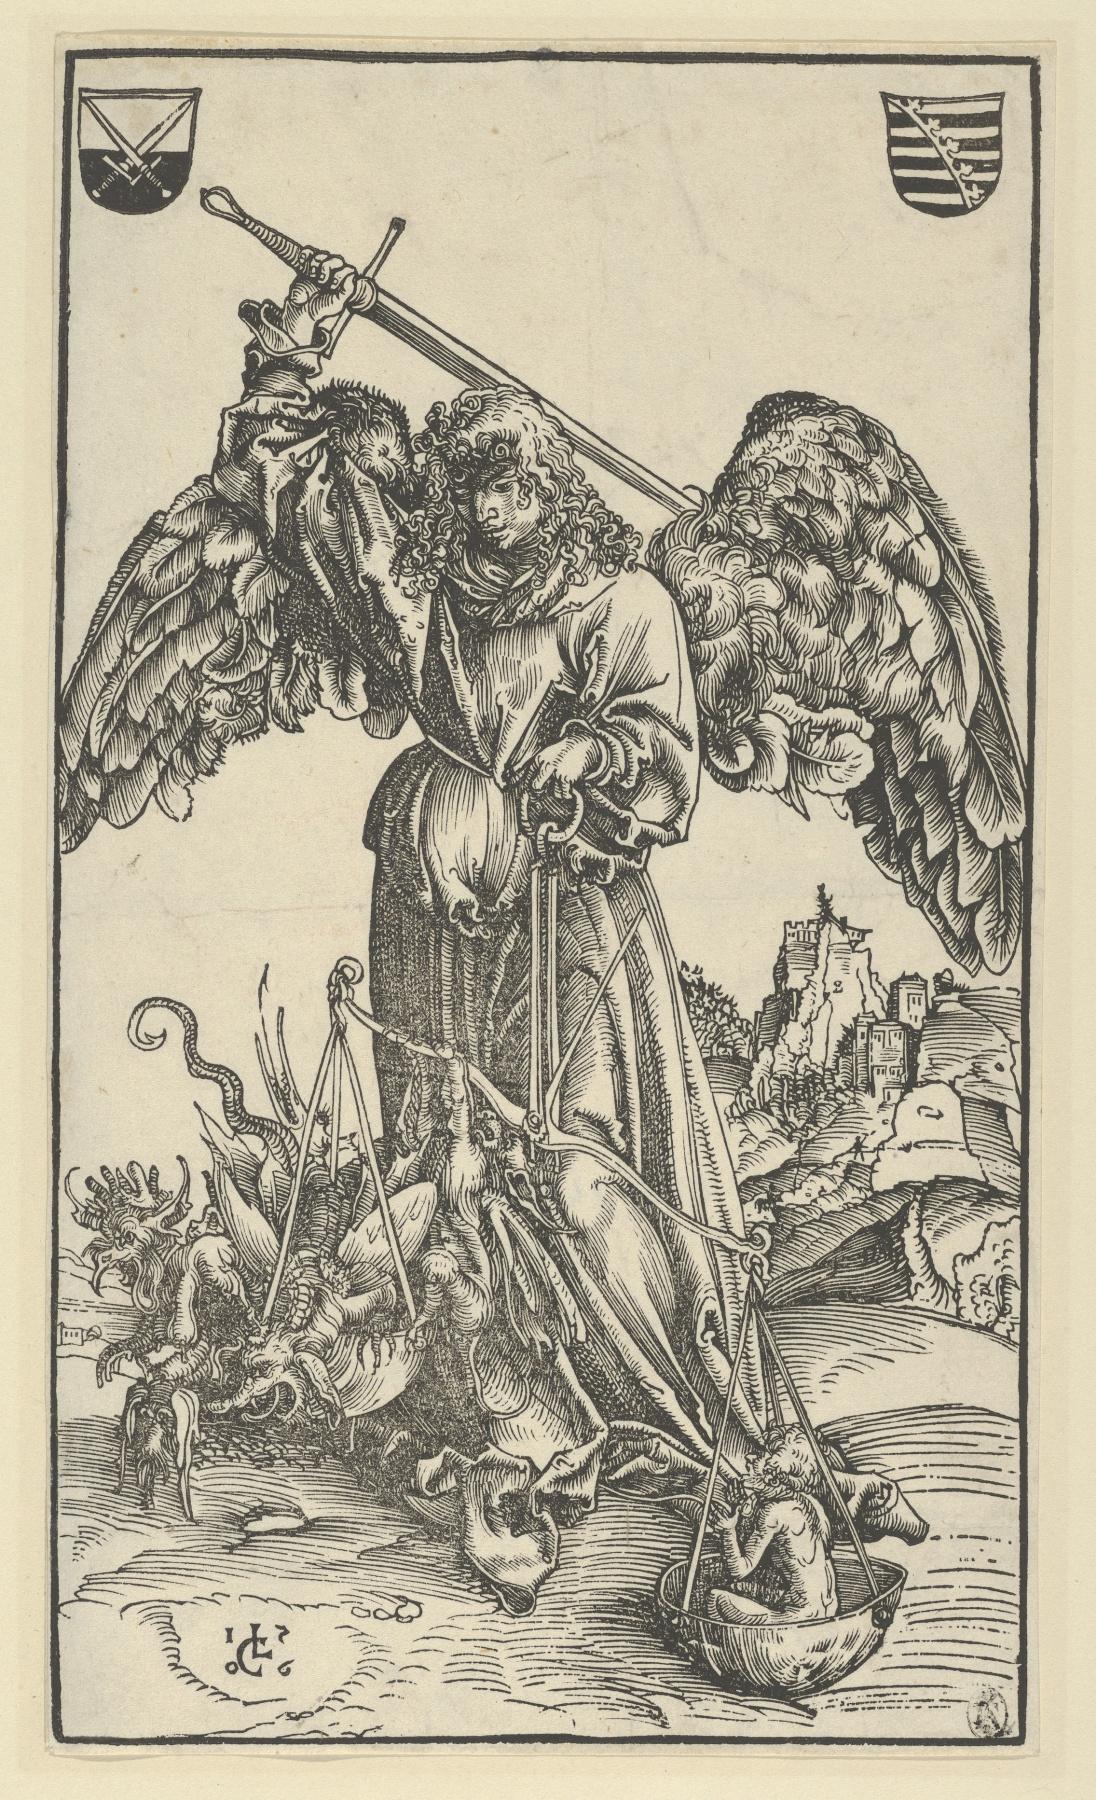 Lucas Cranach the Elder. The Archangel Michael weighing souls